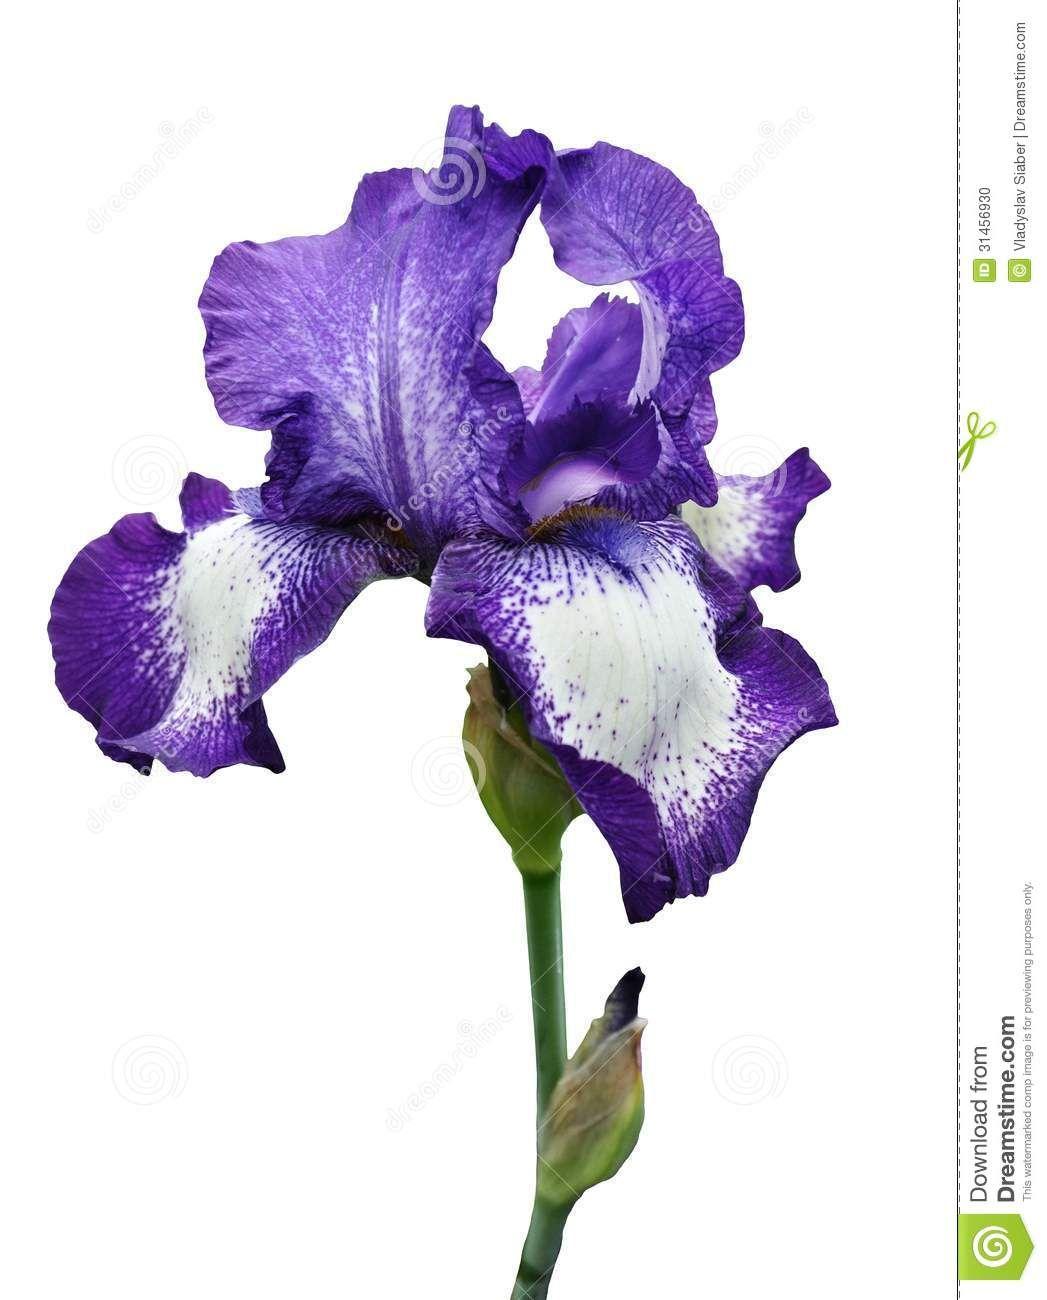 Violet Iris Flower Isolated Stock Photo Image 31456930 Iris Flower Photos Iris Flowers Blue Iris Flowers